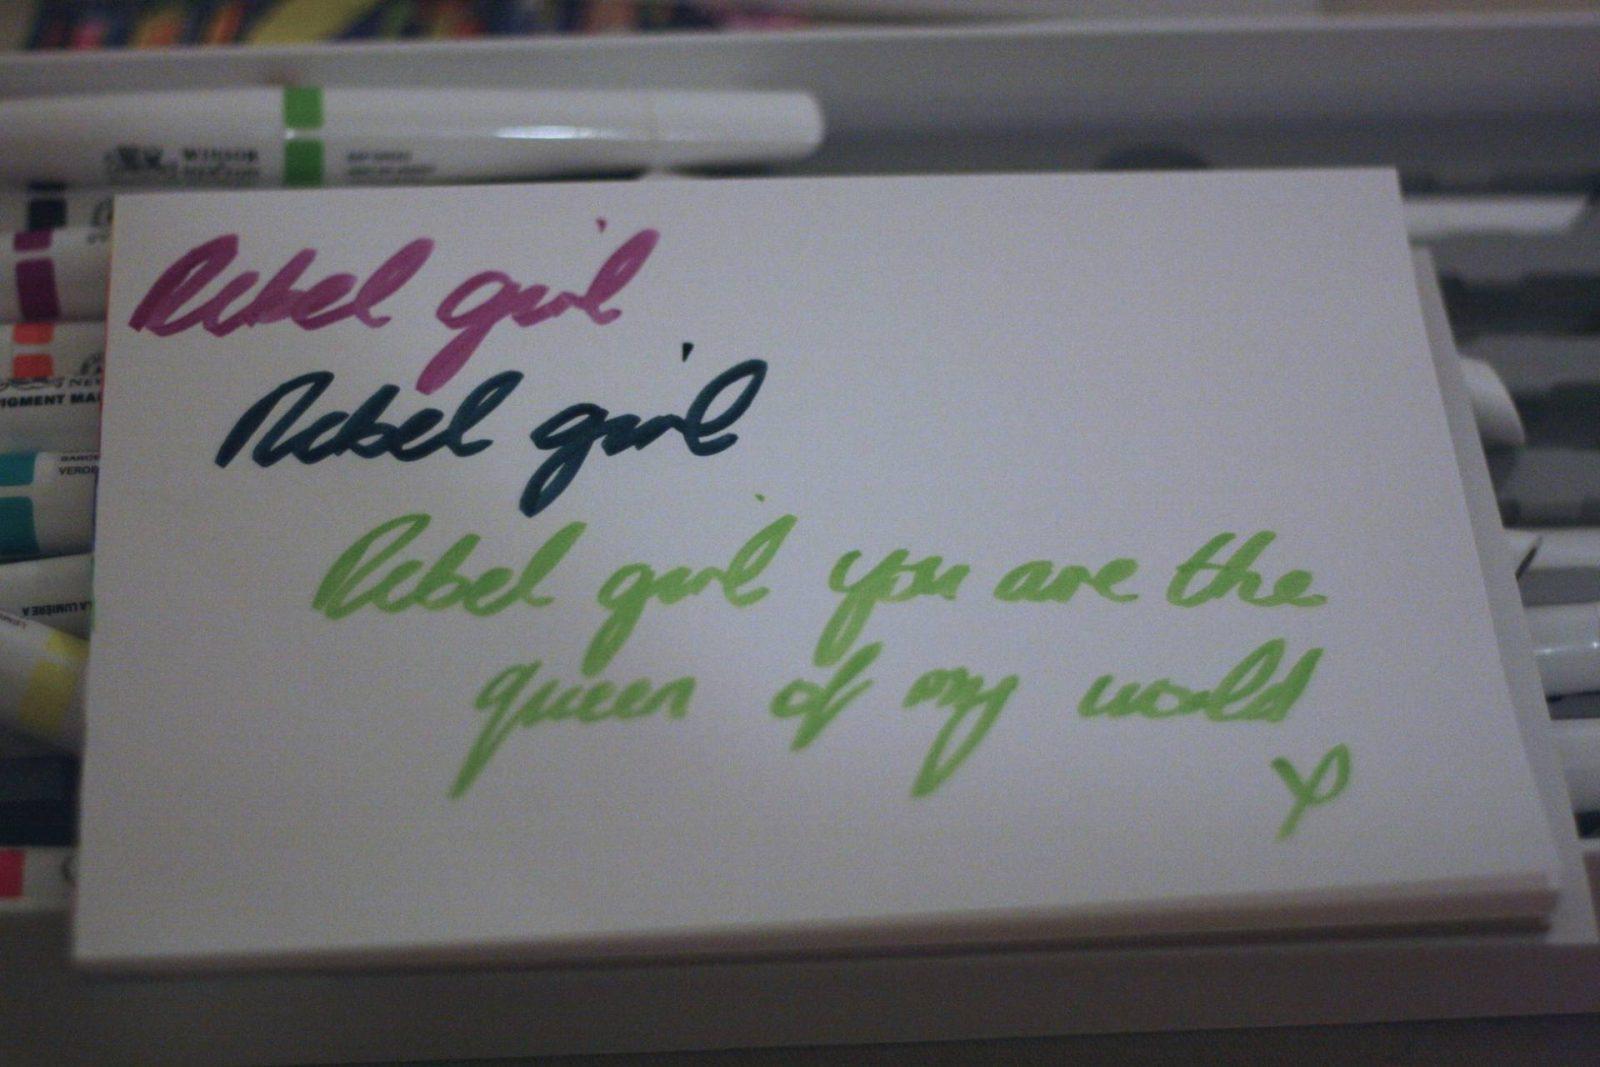 Cass Art Winsor & Newton pigment markers - Rebel Girl